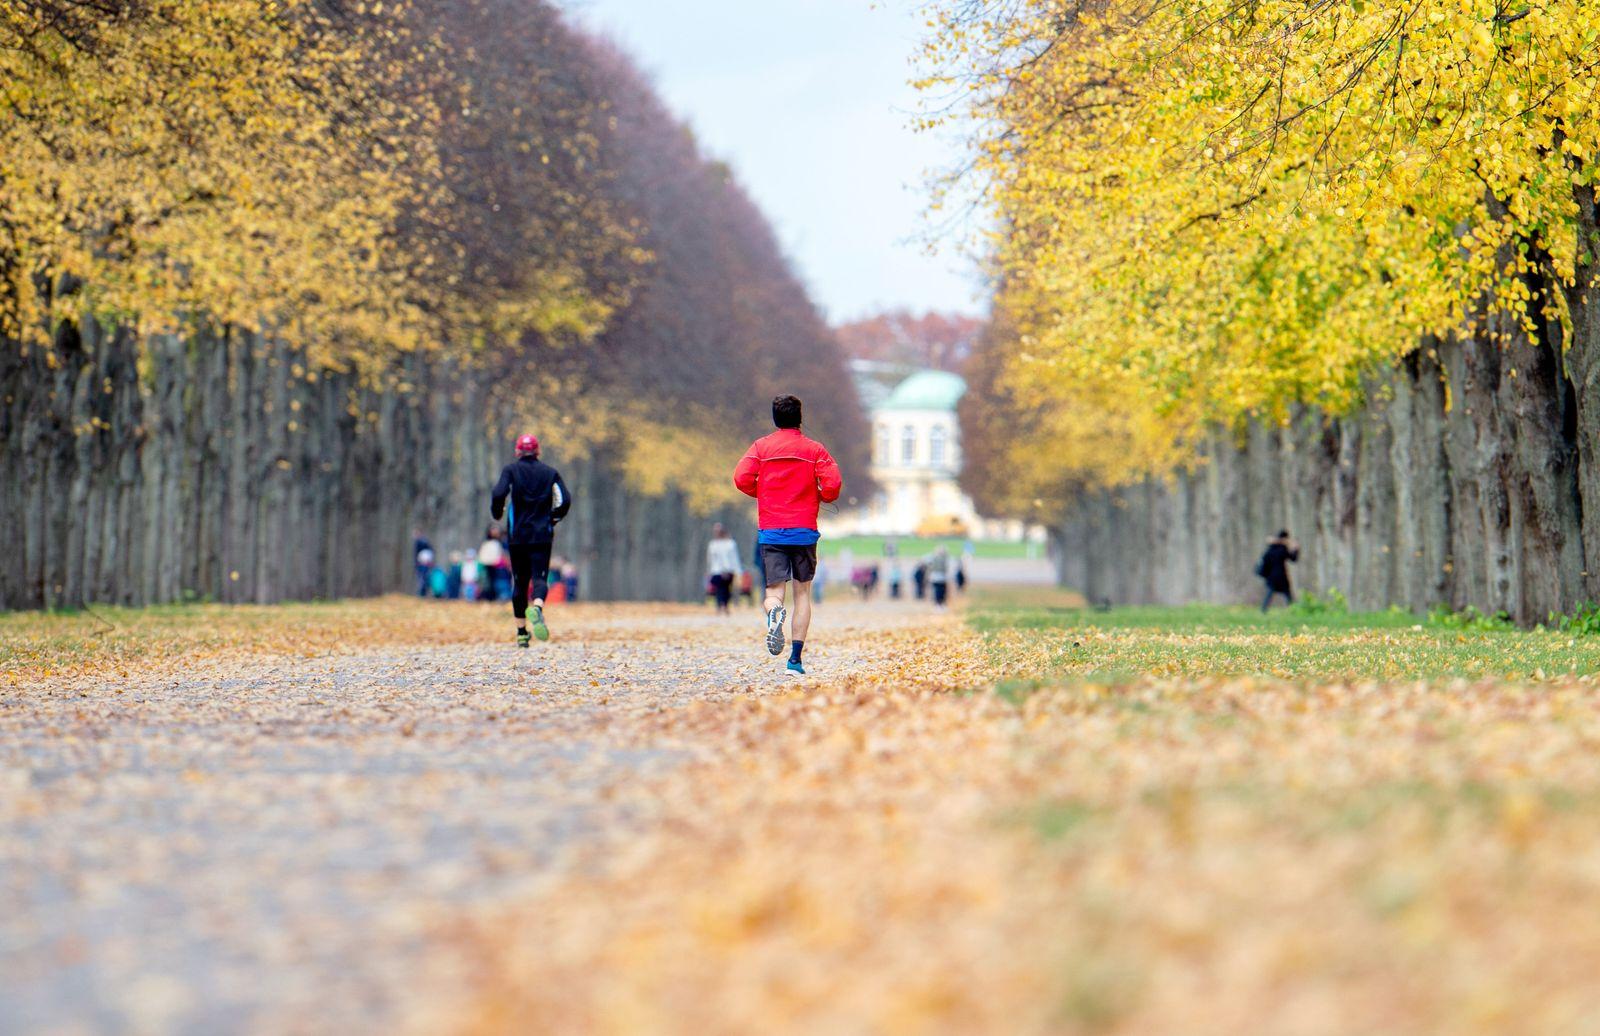 Herbstwetter in Hannover